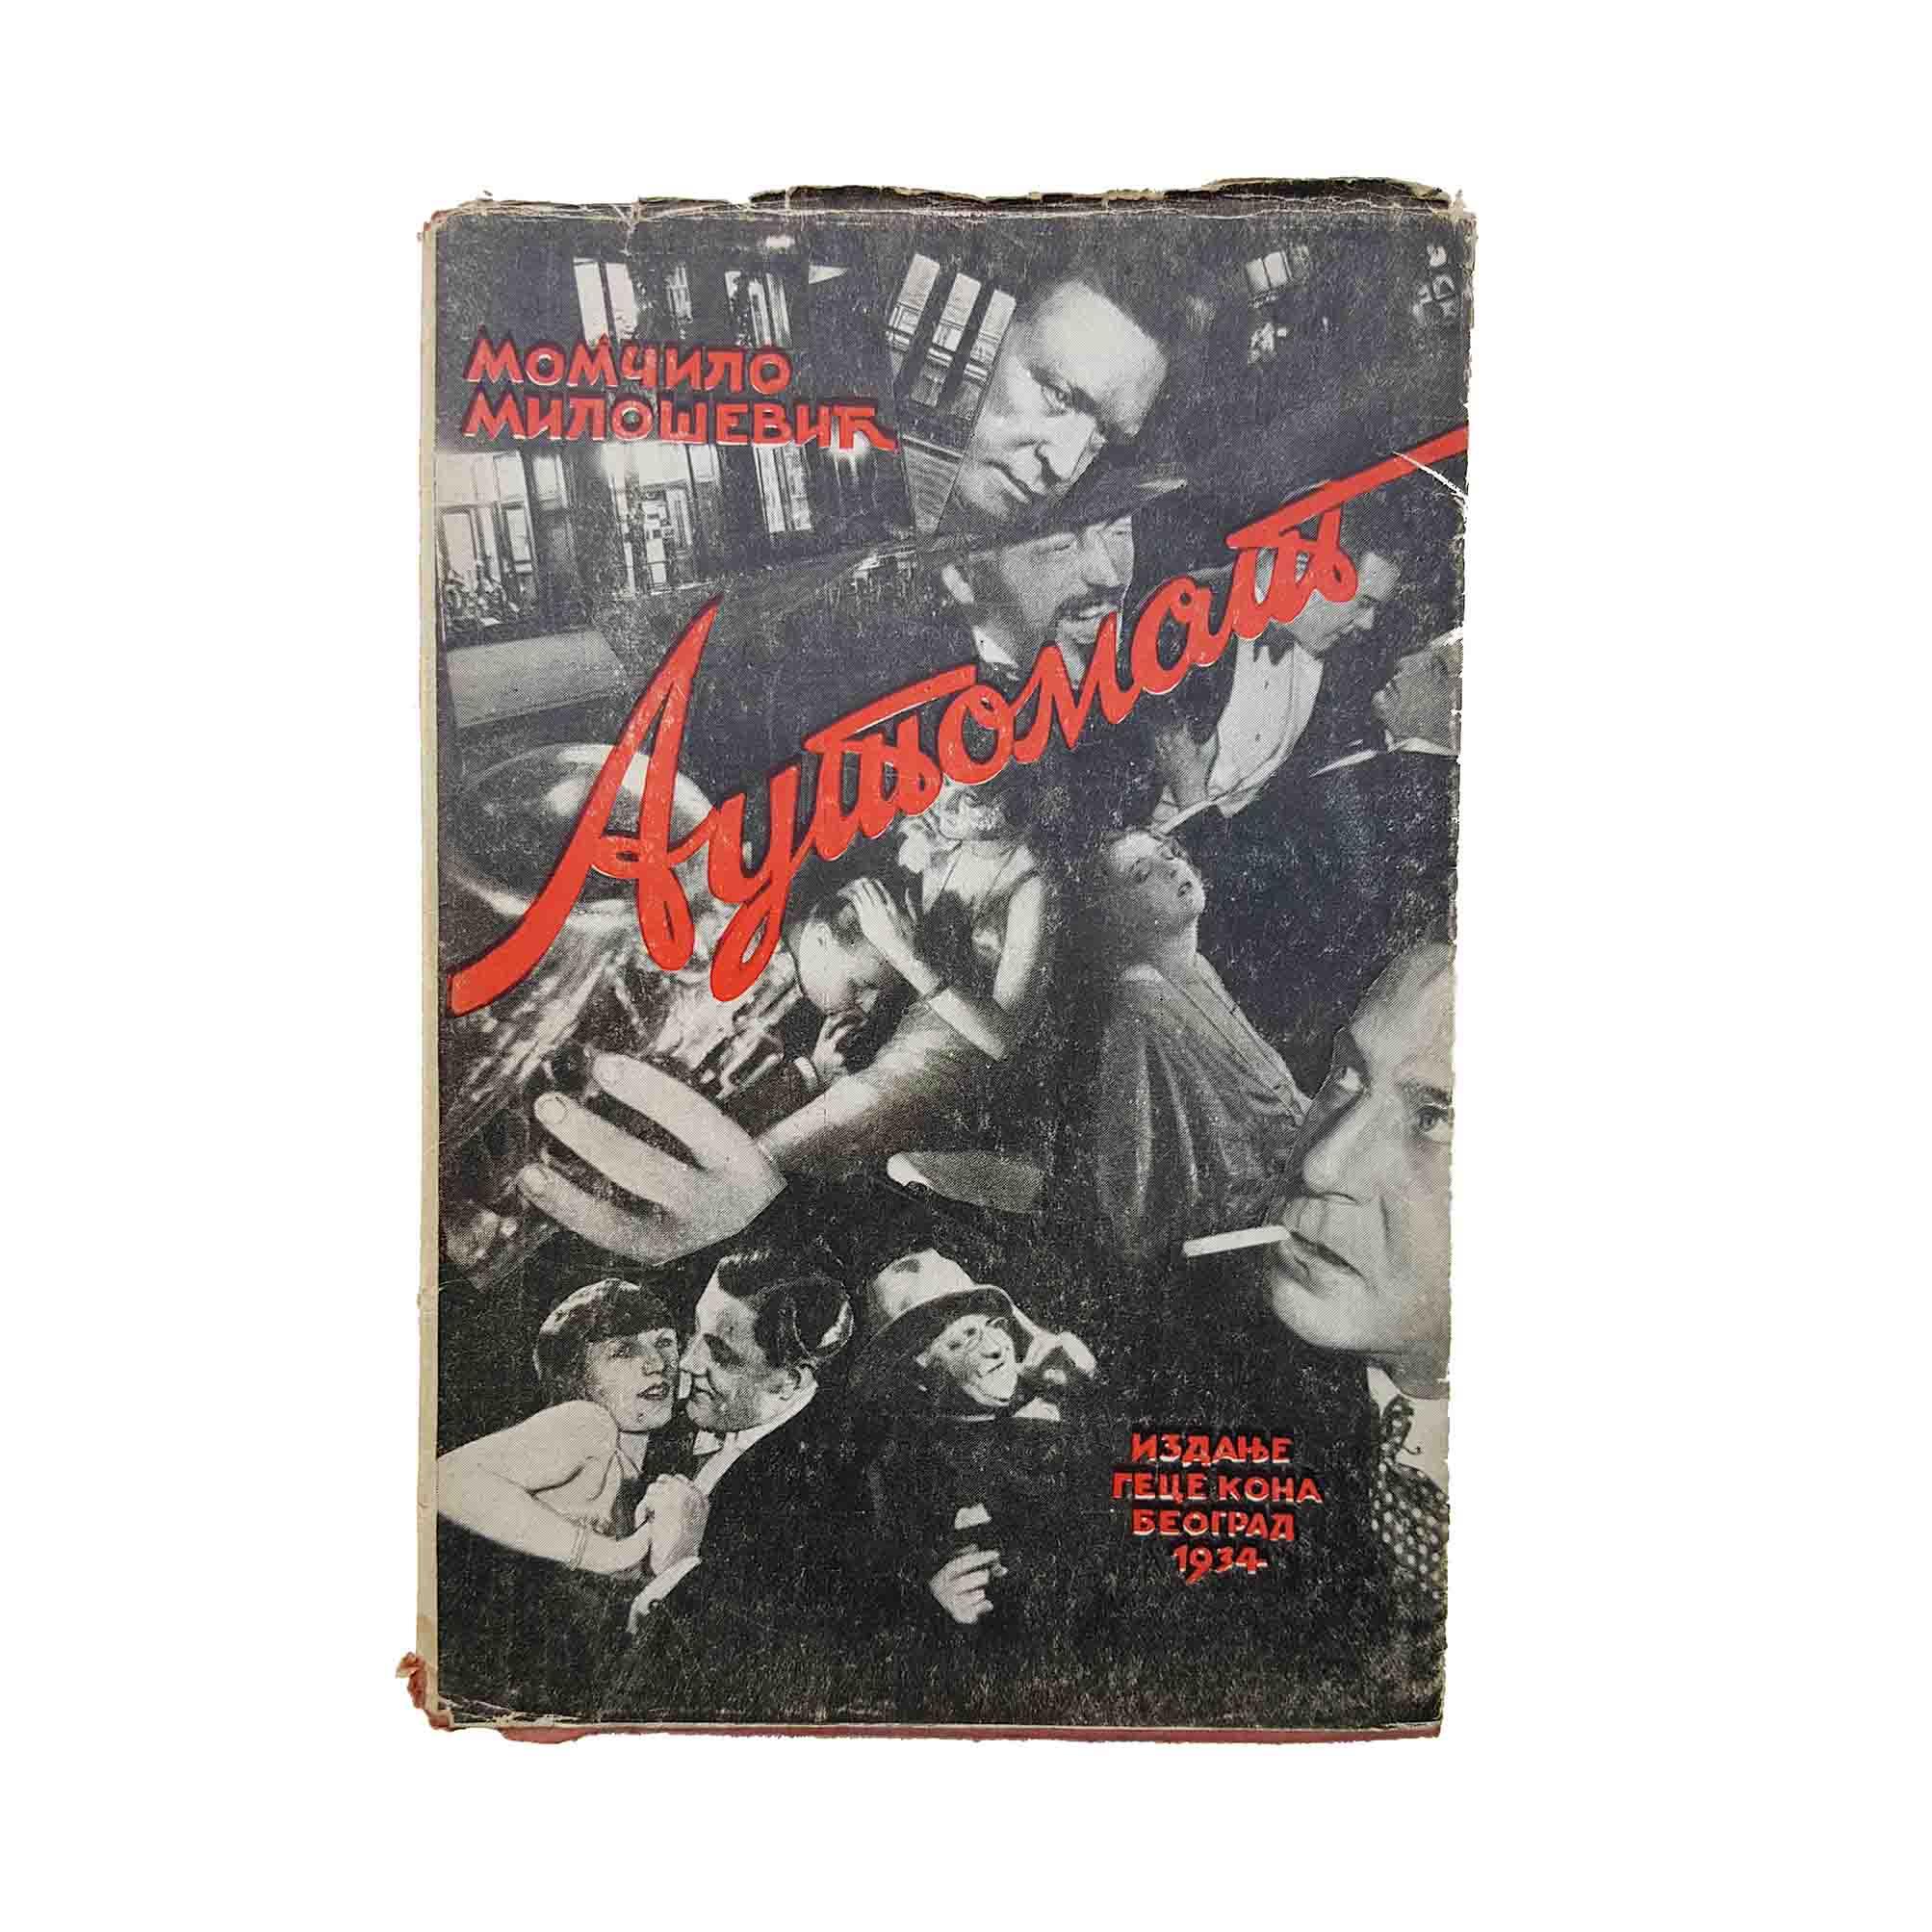 5919-Milosevic-Automat-1933-Umschlag-recto-frei-N.jpg